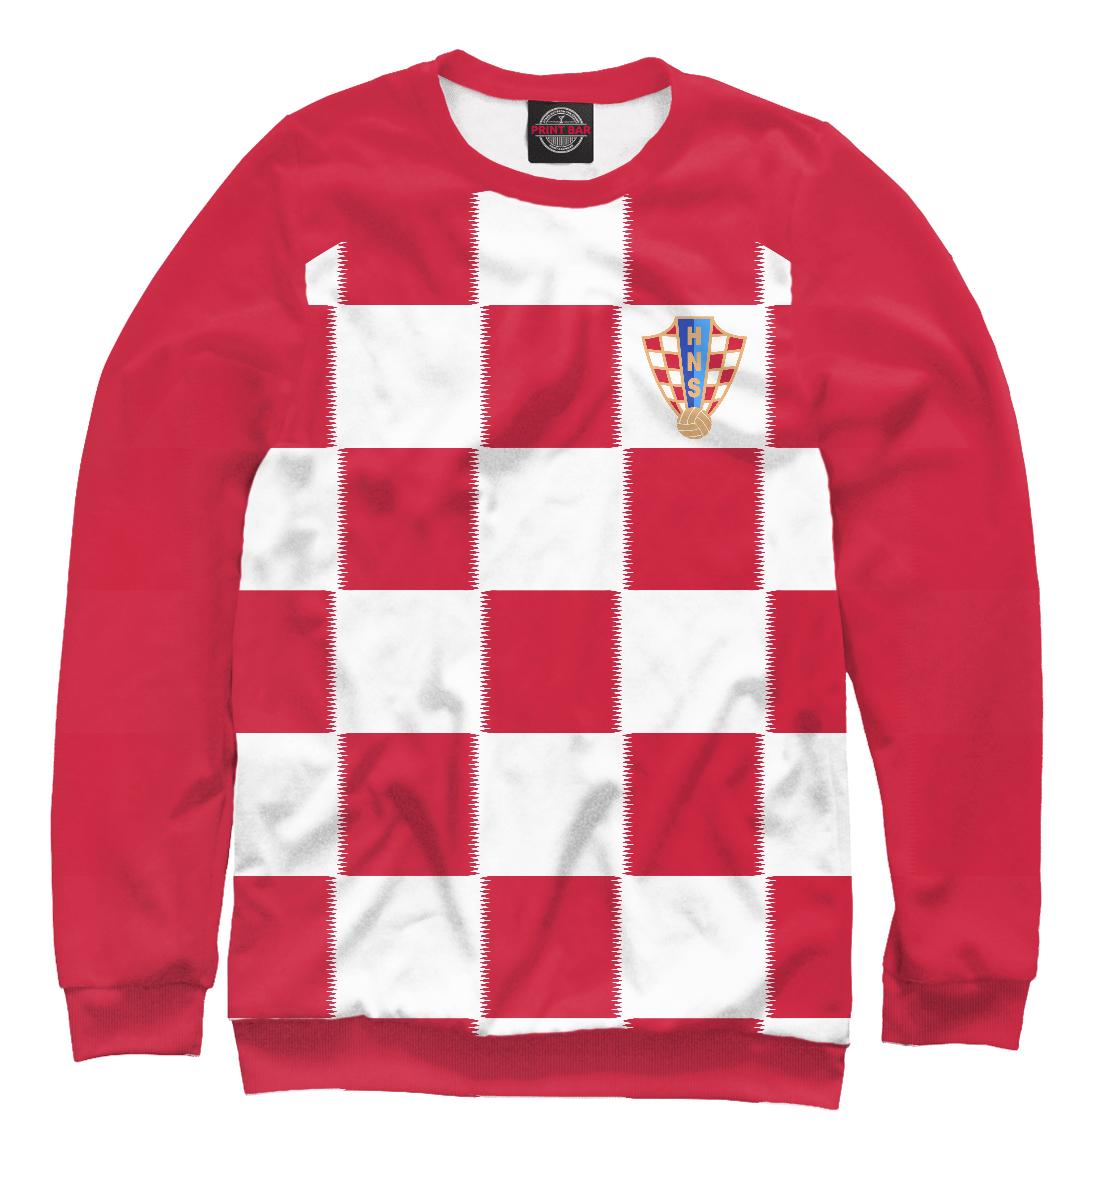 Купить Хорватия, Printbar, Свитшоты, FNS-182039-swi-2